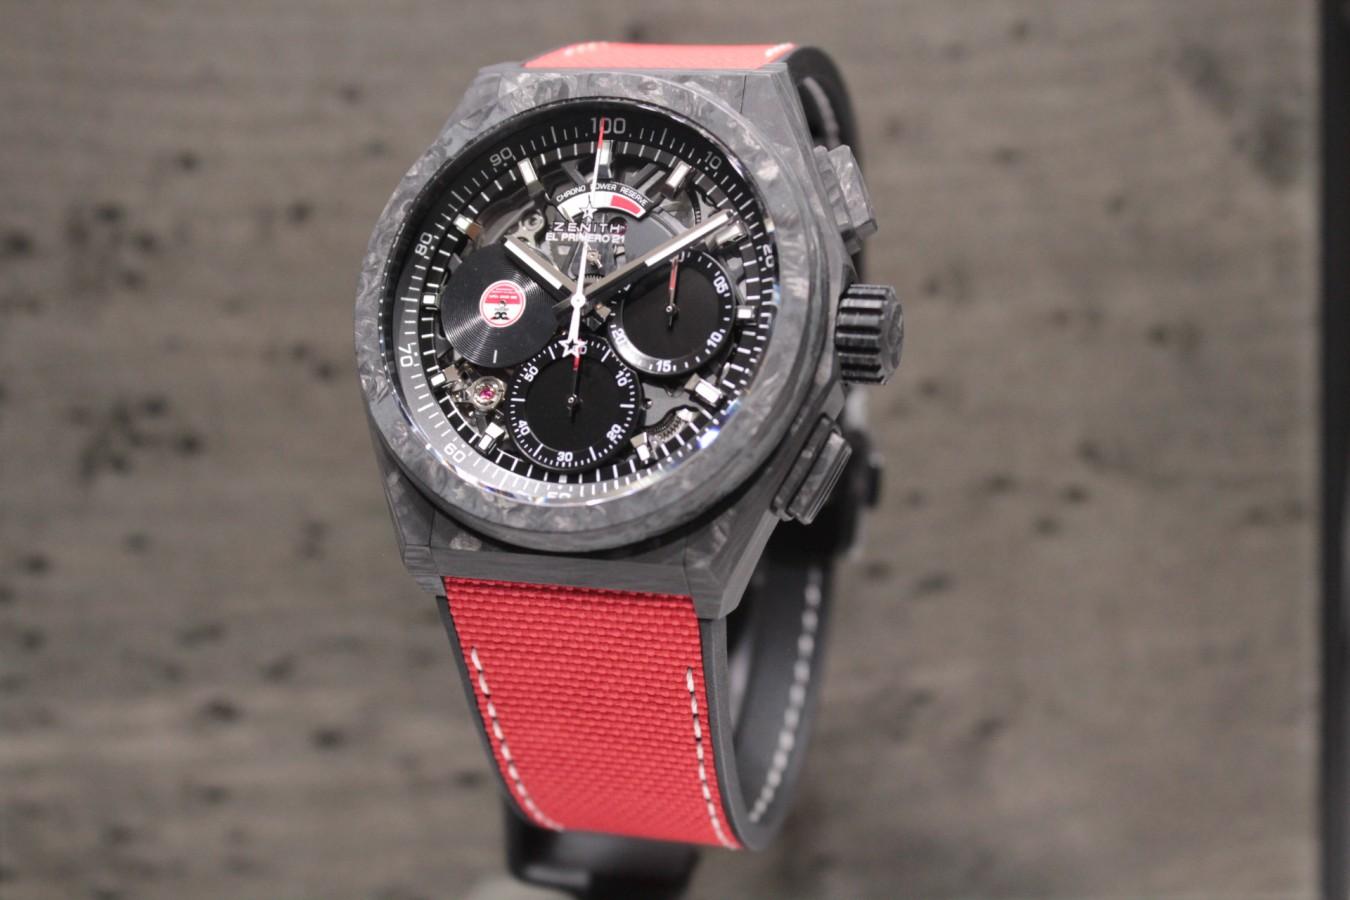 IMG_5884 赤と黒のコントラストがカッコ良い!?世界200本限定のスペシャルモデル「デファイ エル・プリメロ21 カール・コックス エディション」 - DEFY